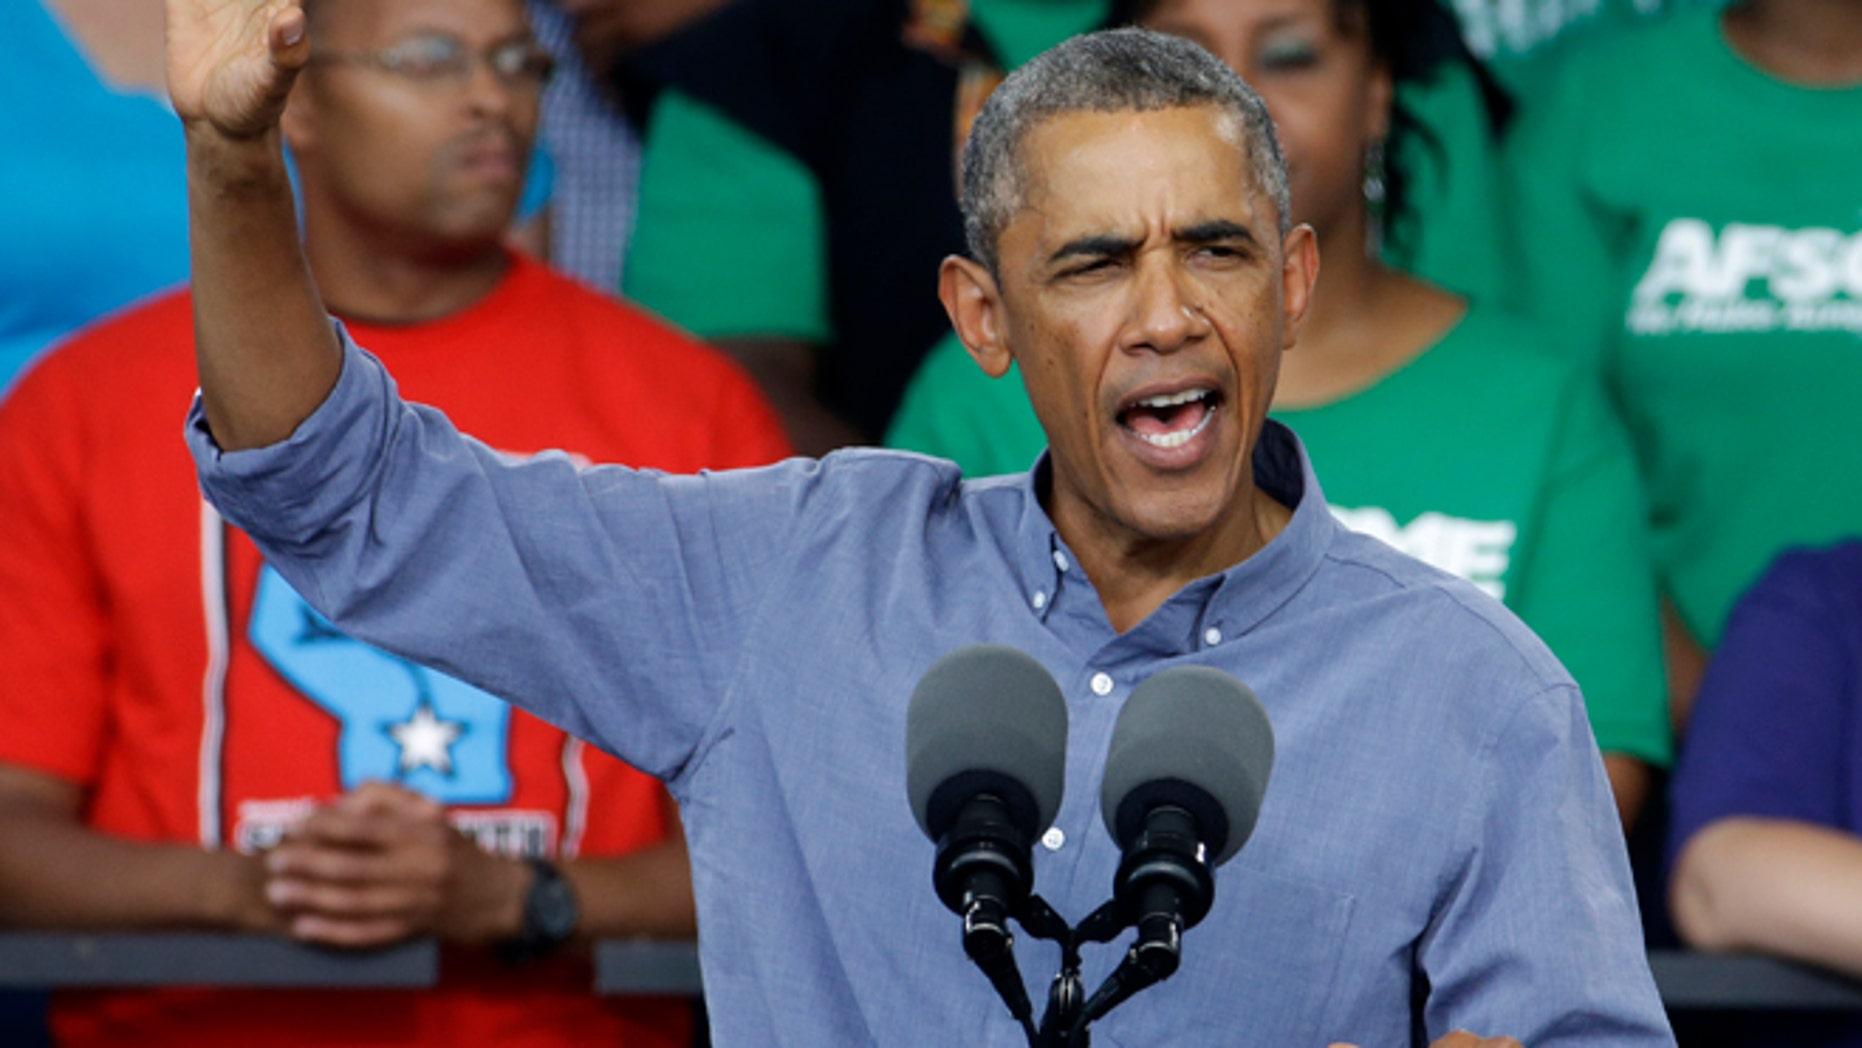 FILE: Sept. 1, 2014: President Obama speaks at Laborfest 2014, at Henry Maier Festival Park, in Milwaukee, Wis.